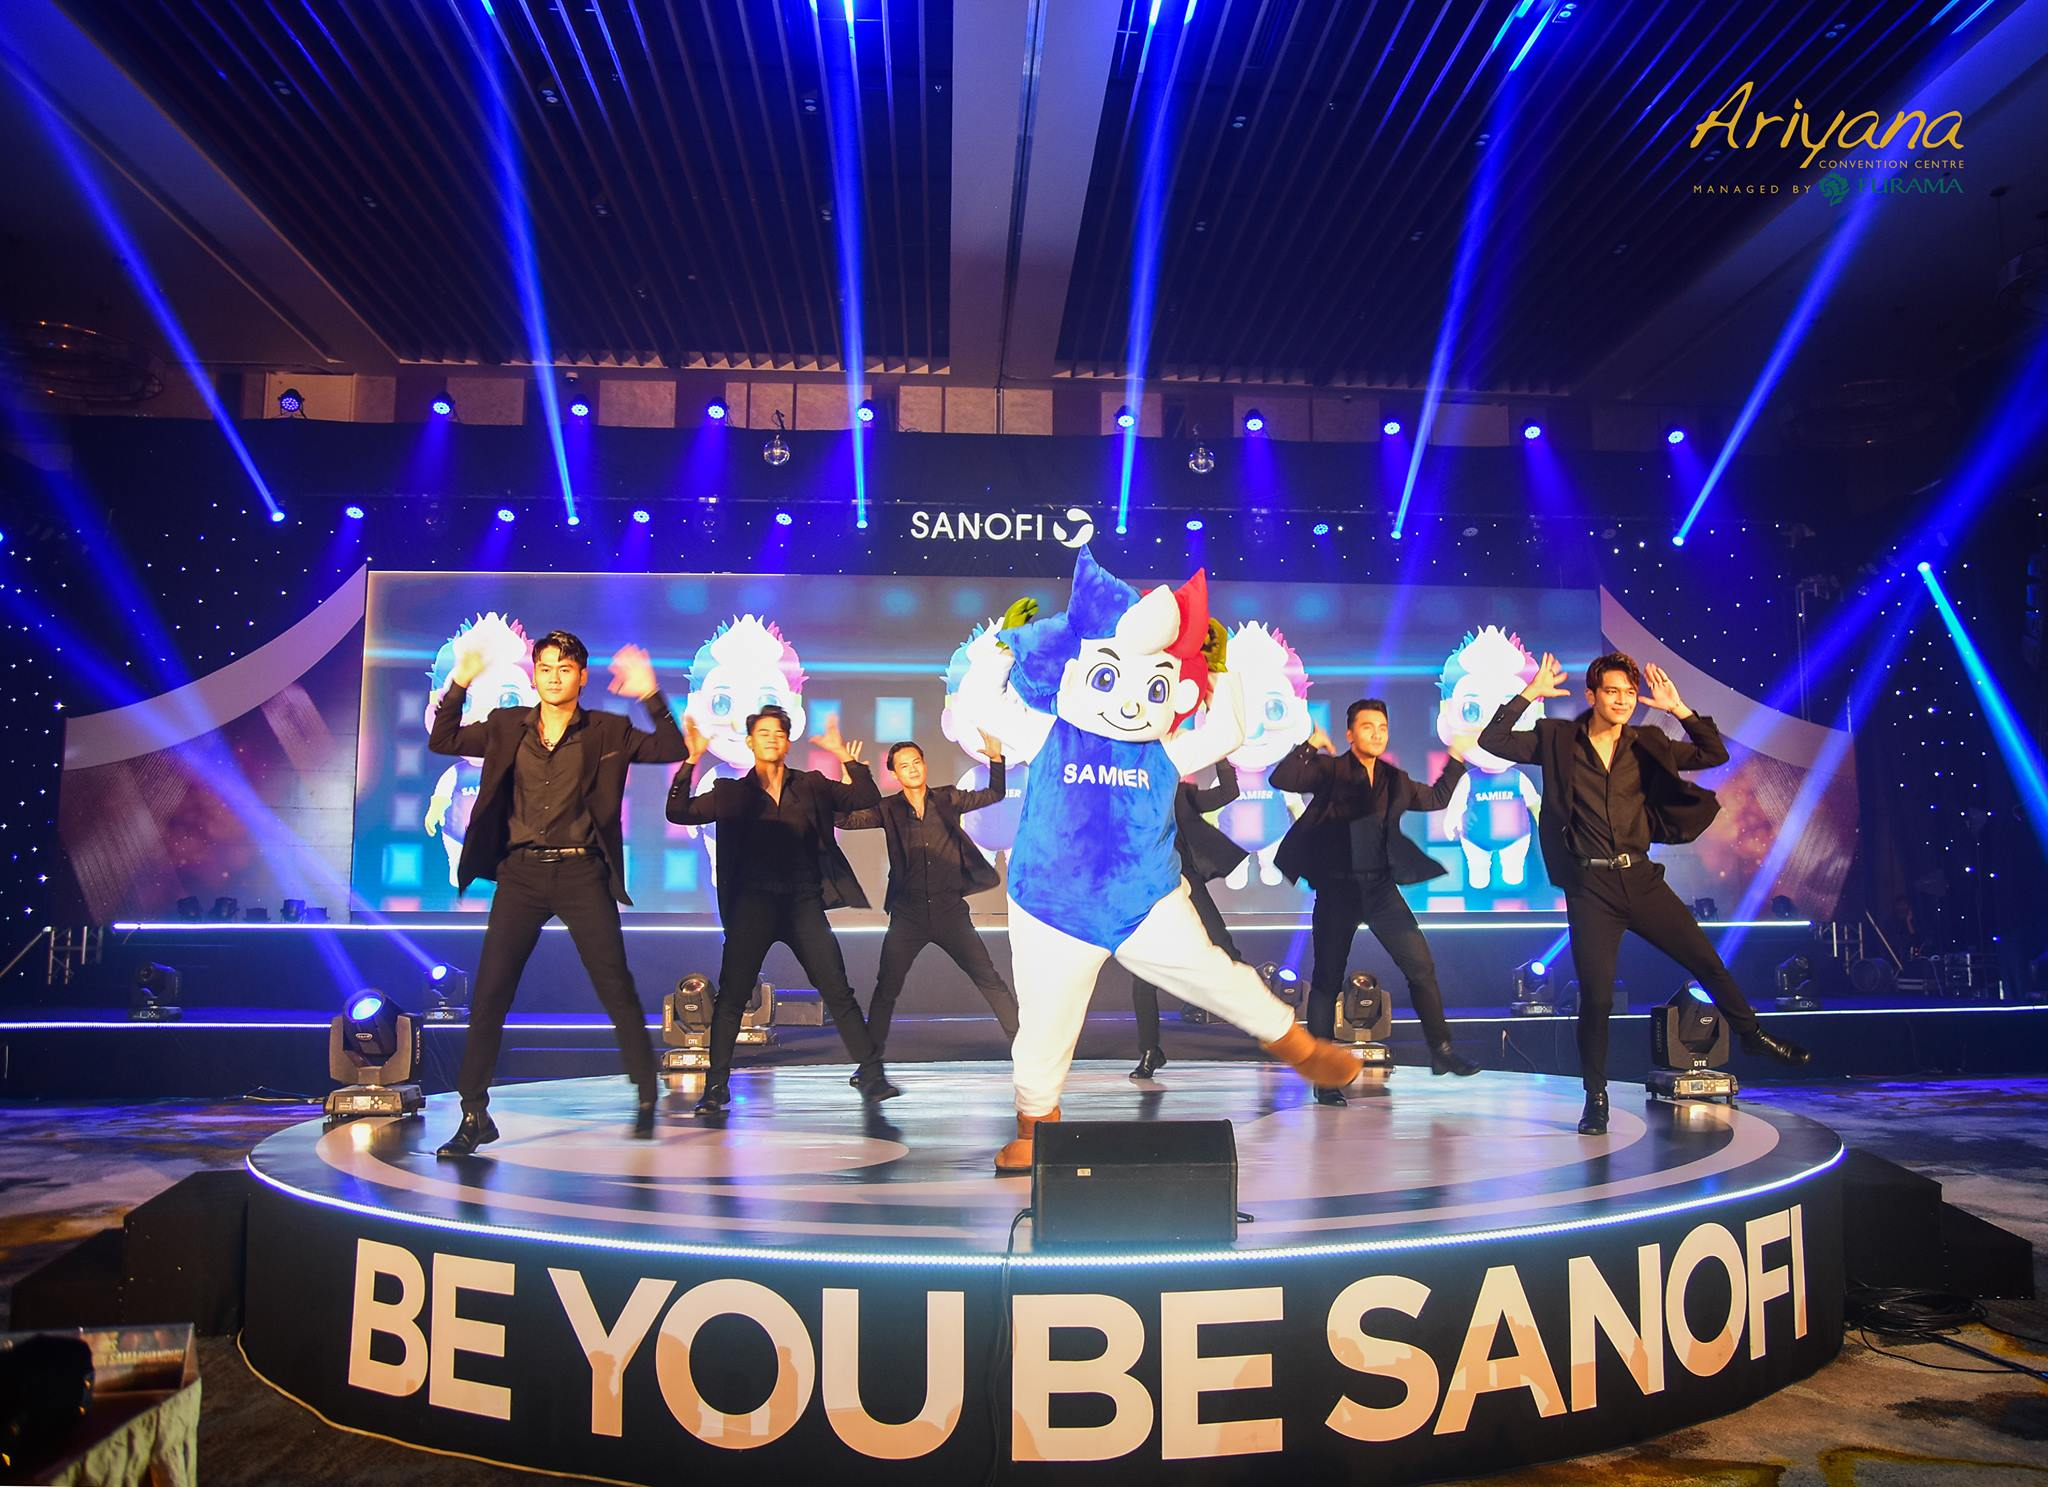 SANOFI ANNUAL MEETING 2019: LIVE YOUR PRIDE